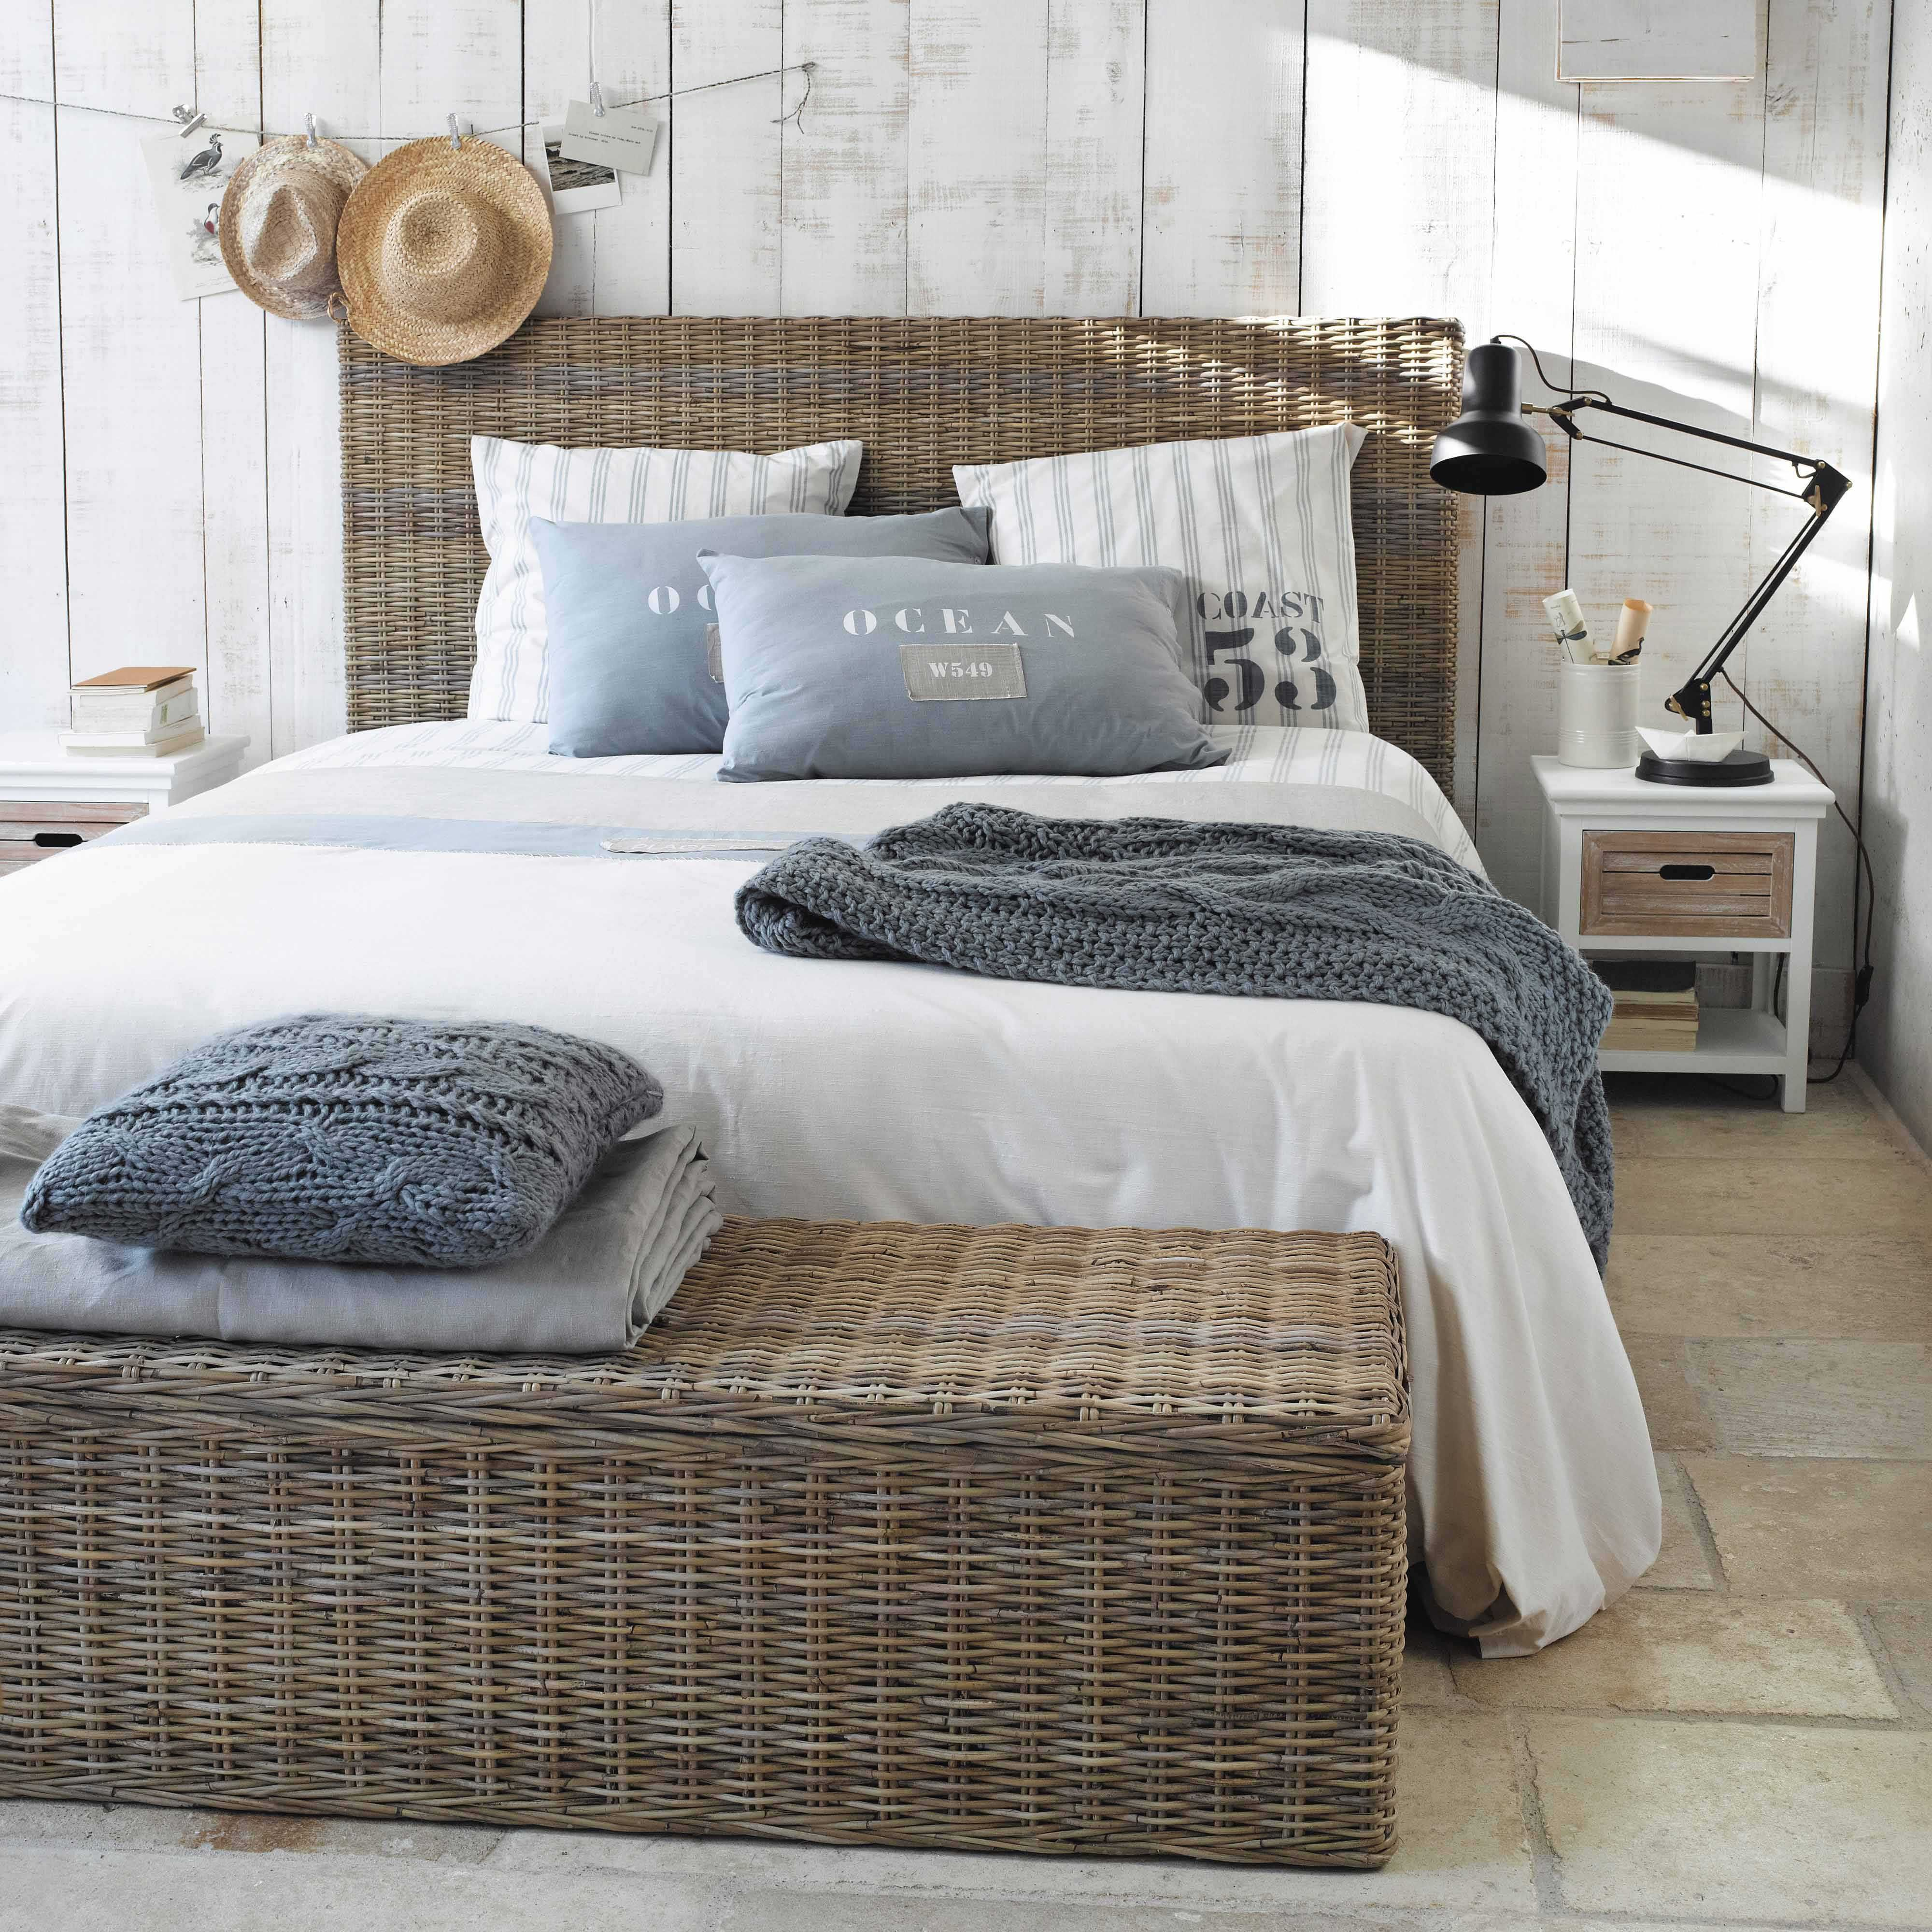 awesome solid mahogany and rattan bed end w cm key west maisons du monde with maison du monde. Black Bedroom Furniture Sets. Home Design Ideas